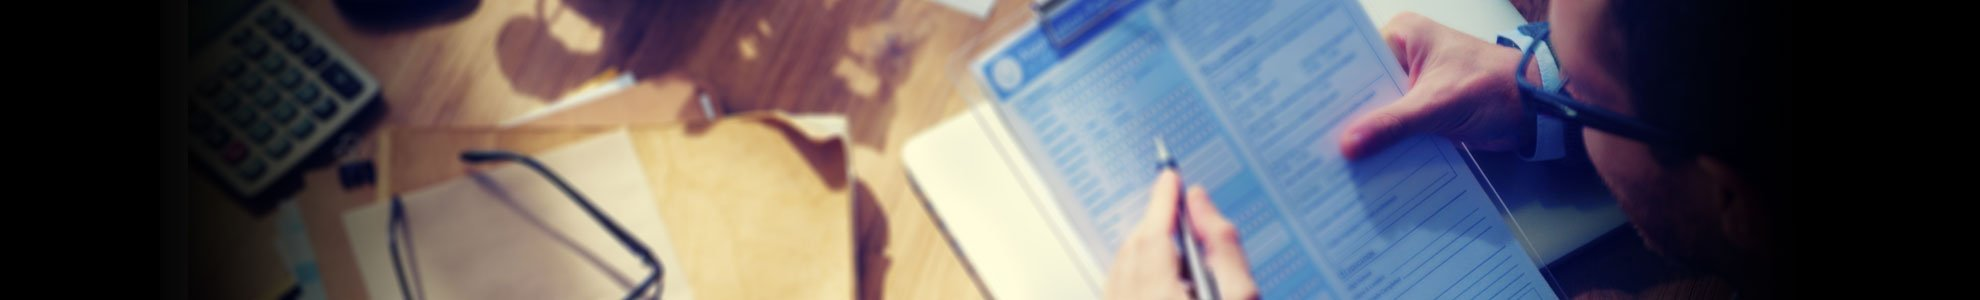 Westralian Insurance claim process